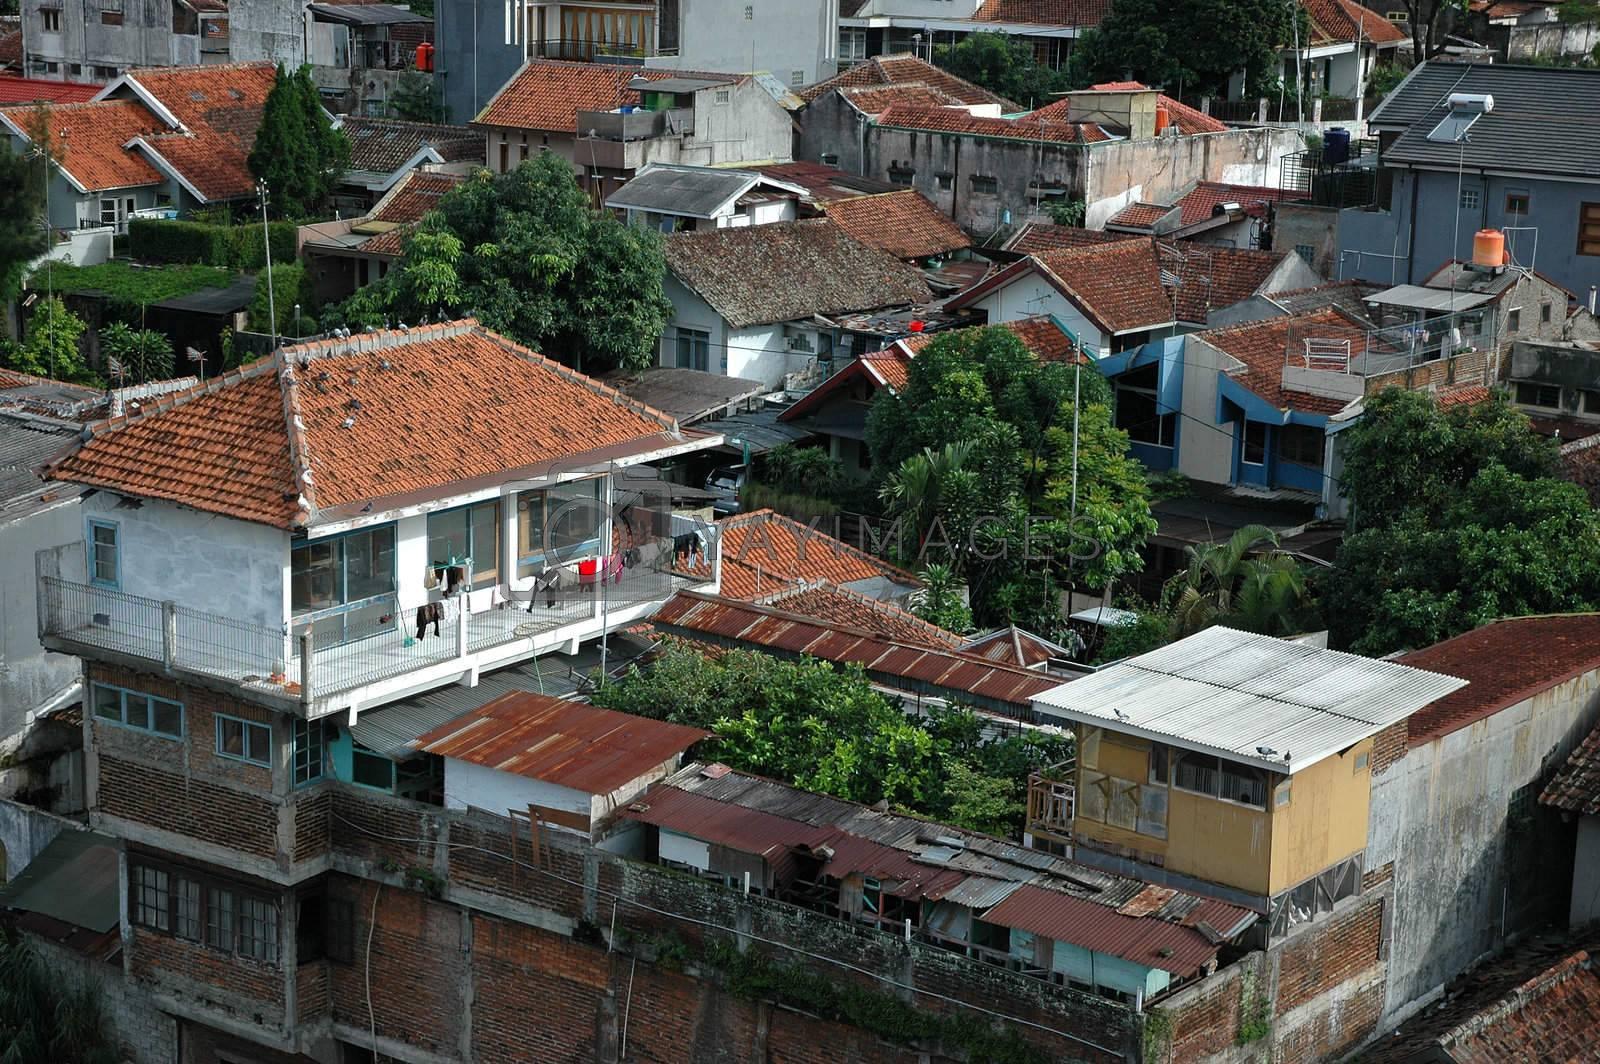 slum area by bluemarine